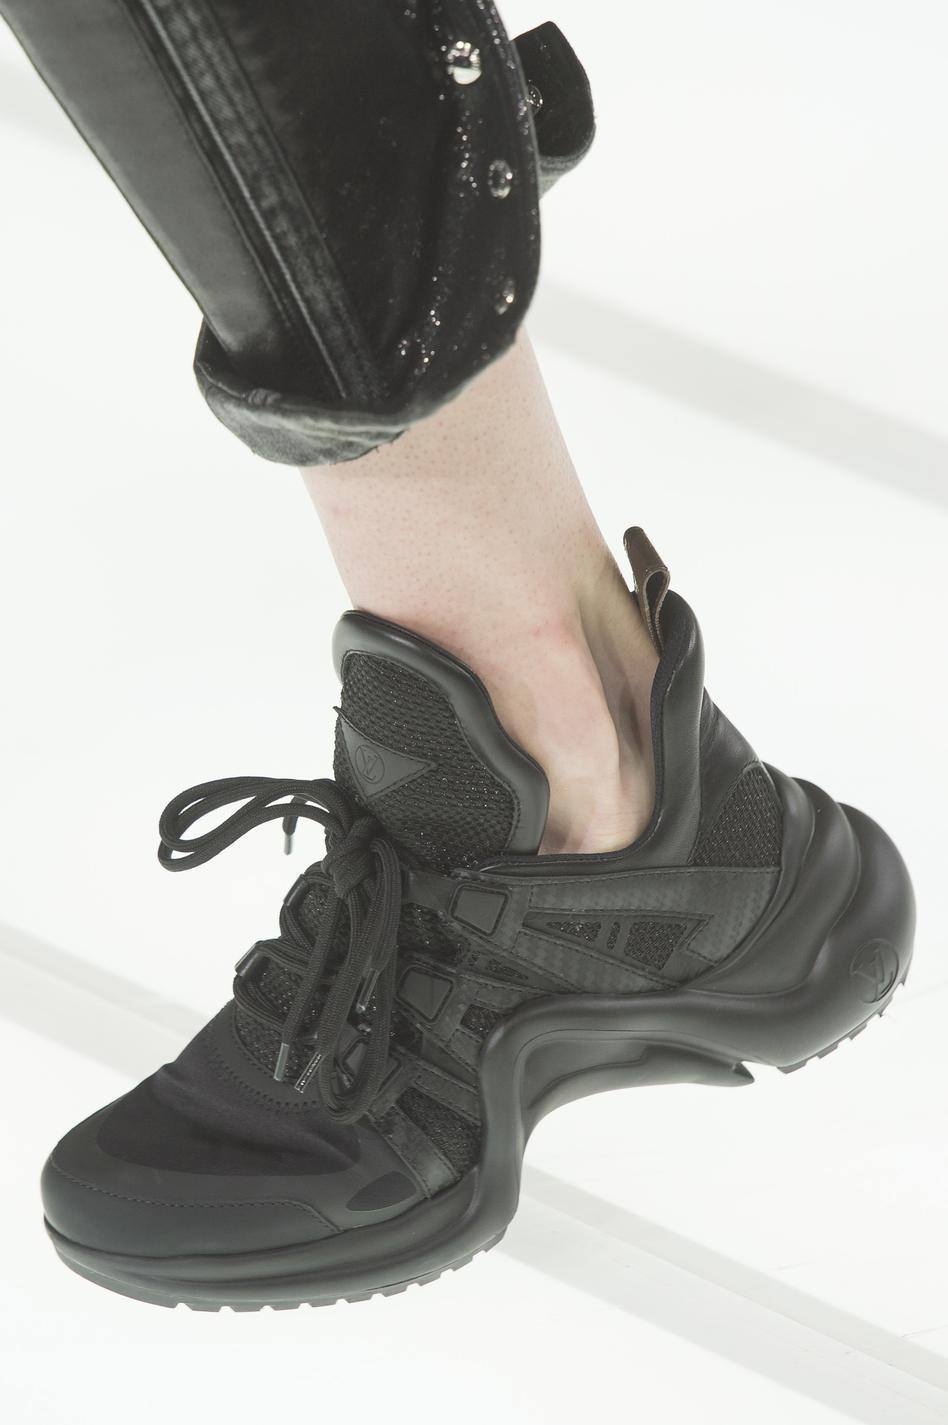 chaussures chanel 2018. Black Bedroom Furniture Sets. Home Design Ideas